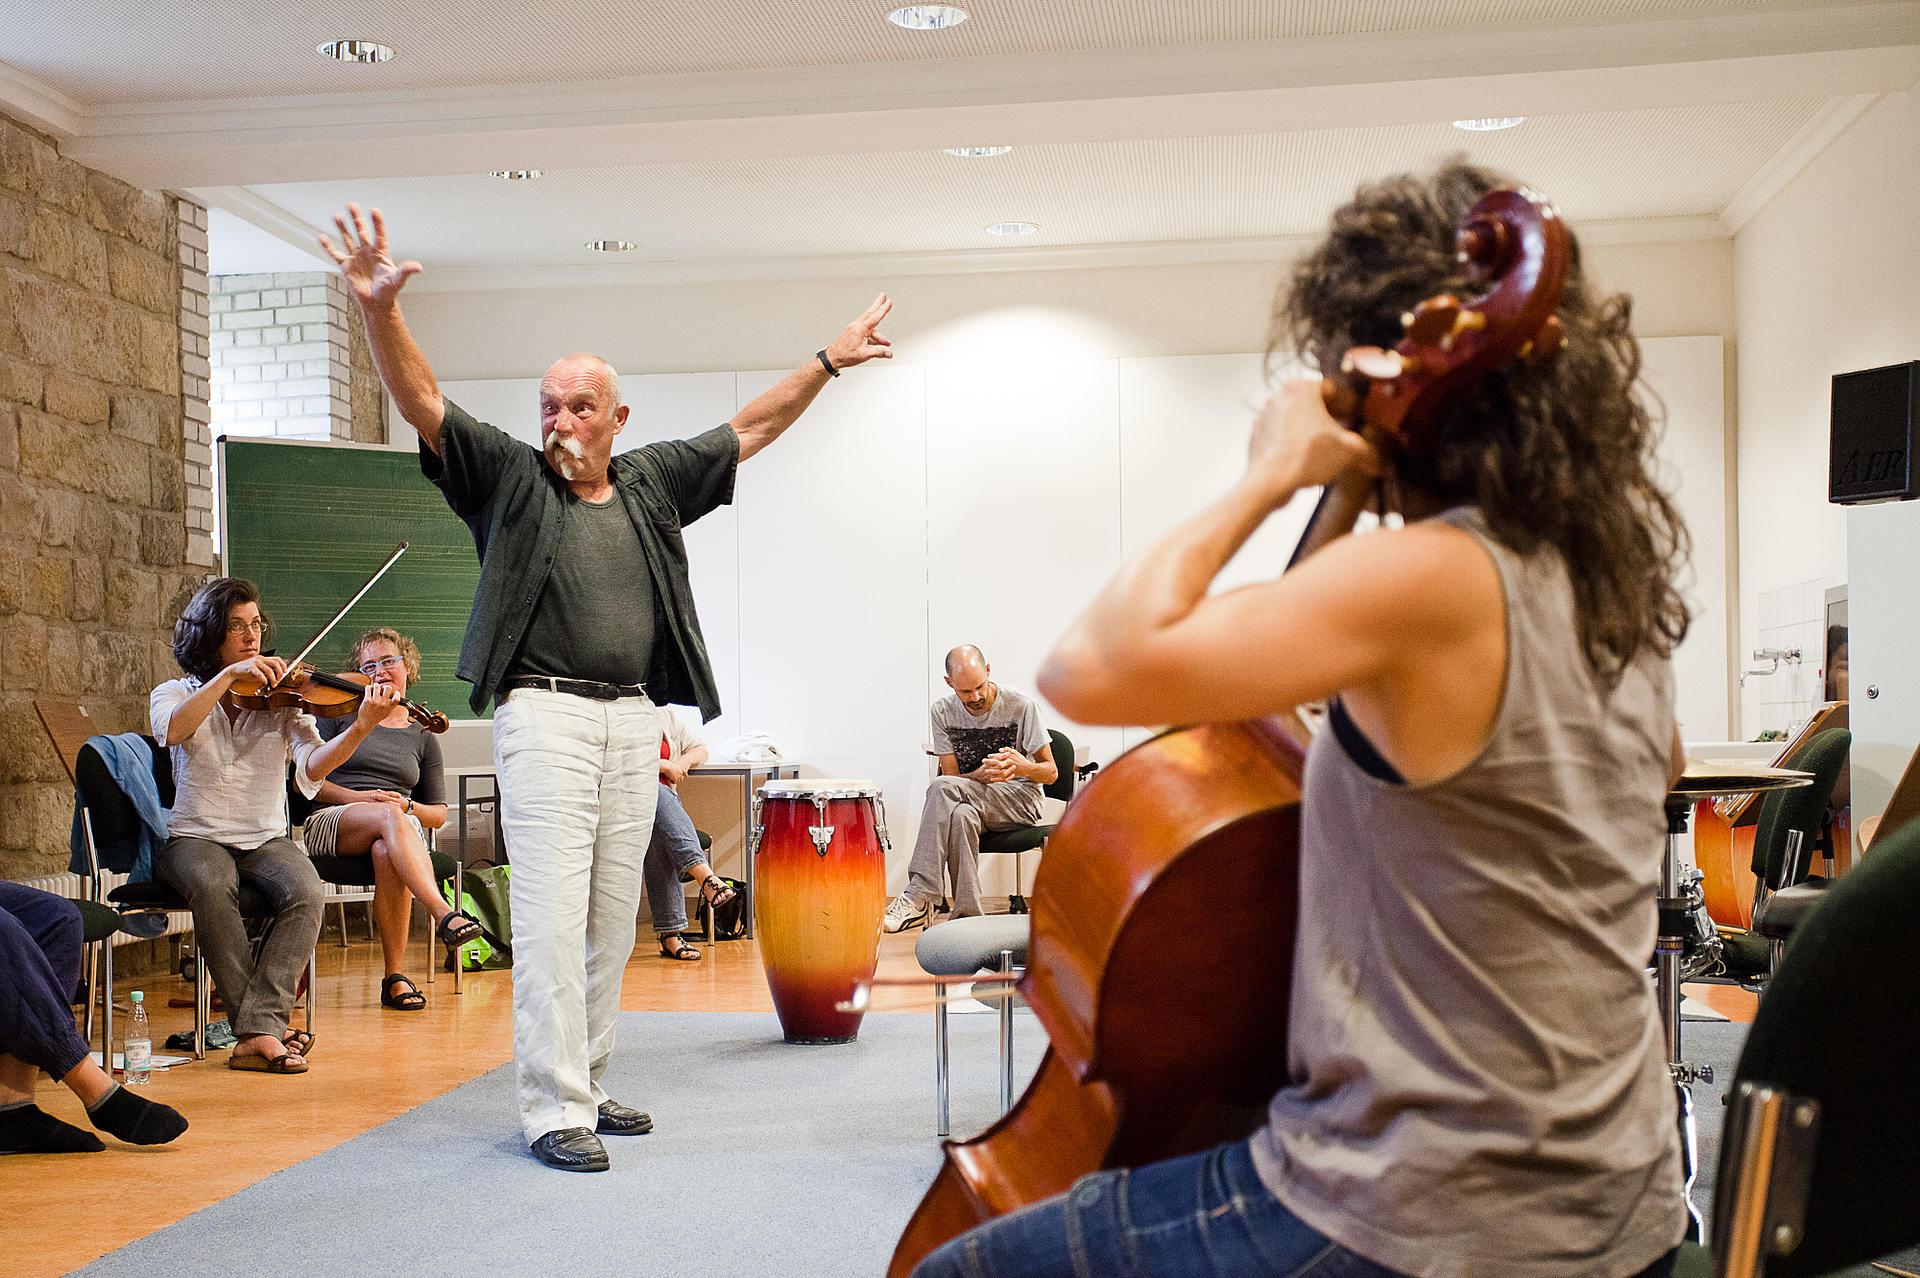 Meisterkurs Freie Improvisation, Prof. Günter Baby Sommer (Foto: Ronny Waleska)